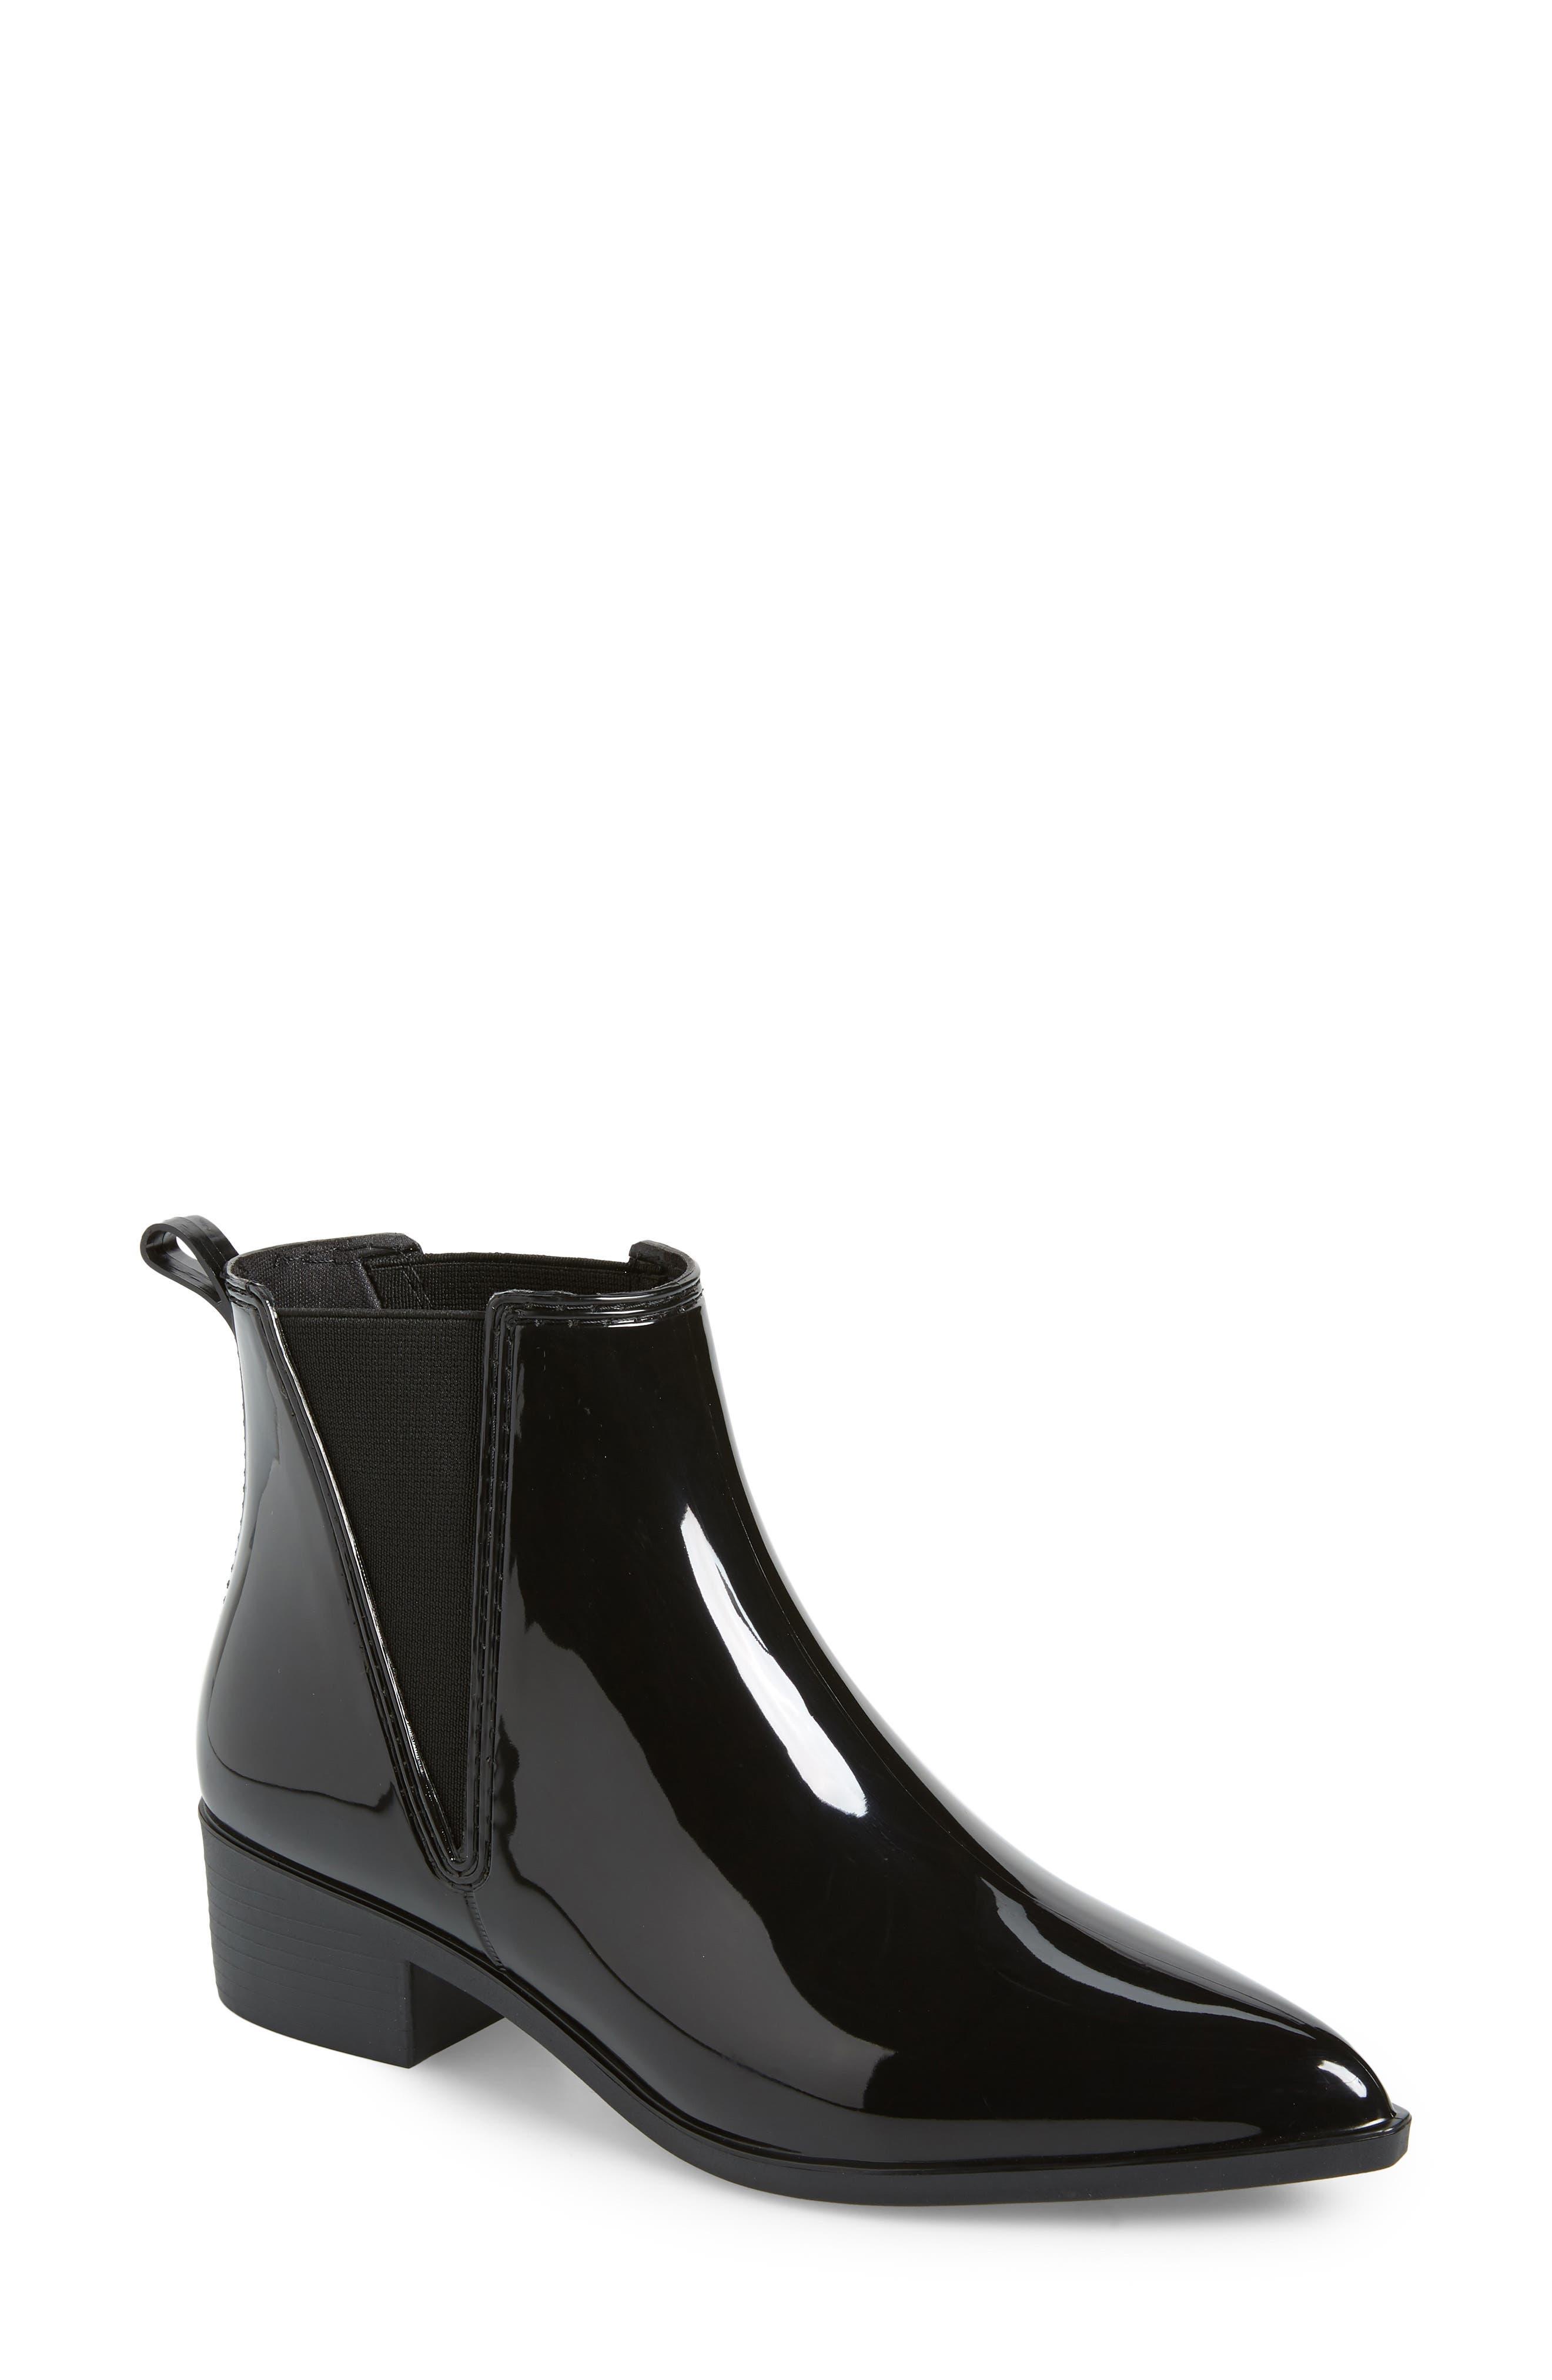 Mist Chelsea Waterproof Rain Boot,                         Main,                         color, BLACK SHINY